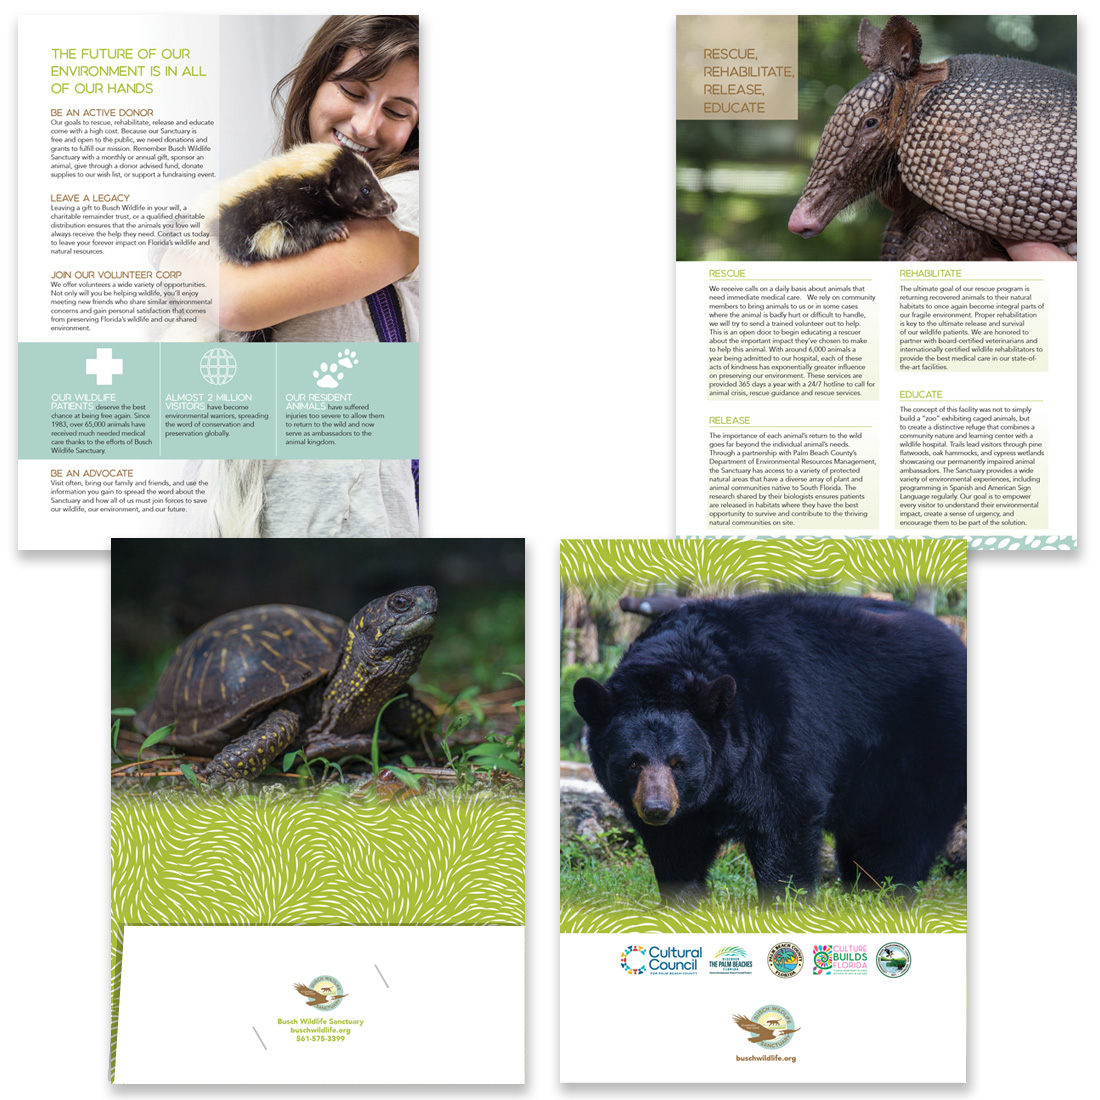 Busch Wildlife Sanctuary brochure